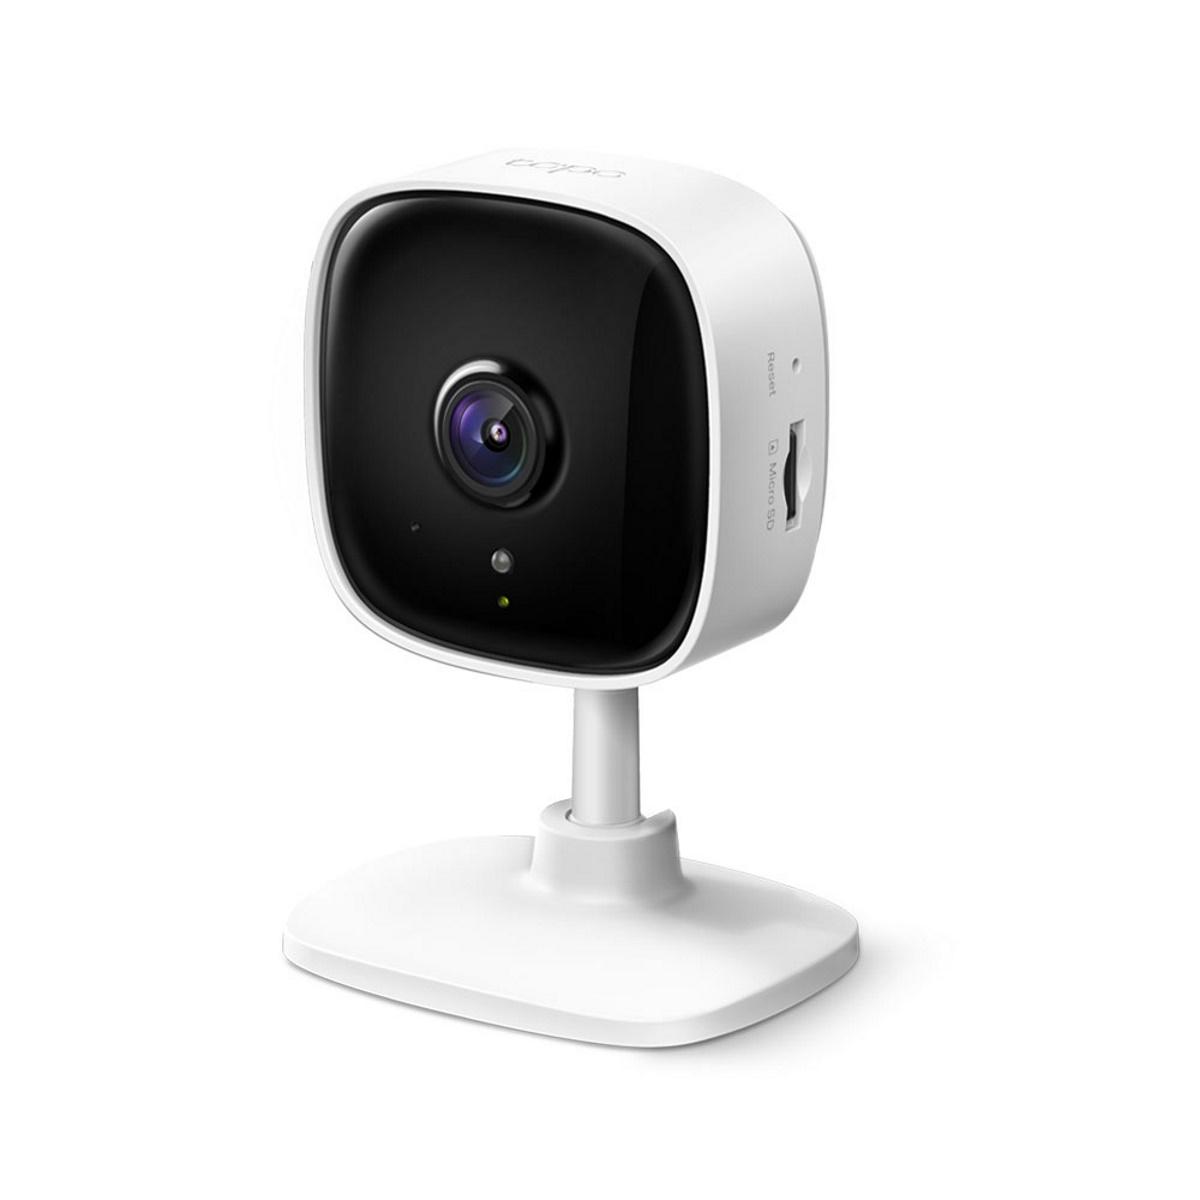 Kamera TP-Link Tapo C100 10,8 Mpx